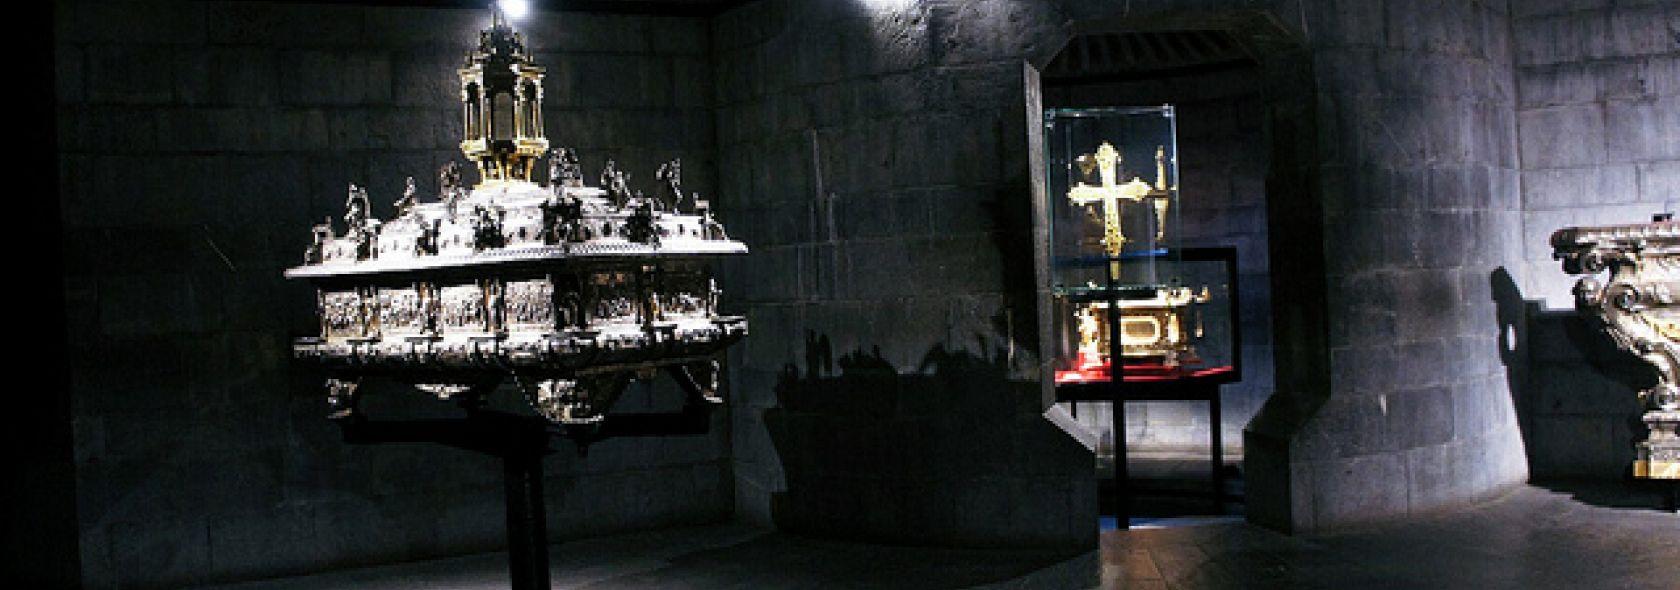 Museo Tesoro Cattedrale San Lorenzo - foto: Rinaldi - ©genovacittadigitale